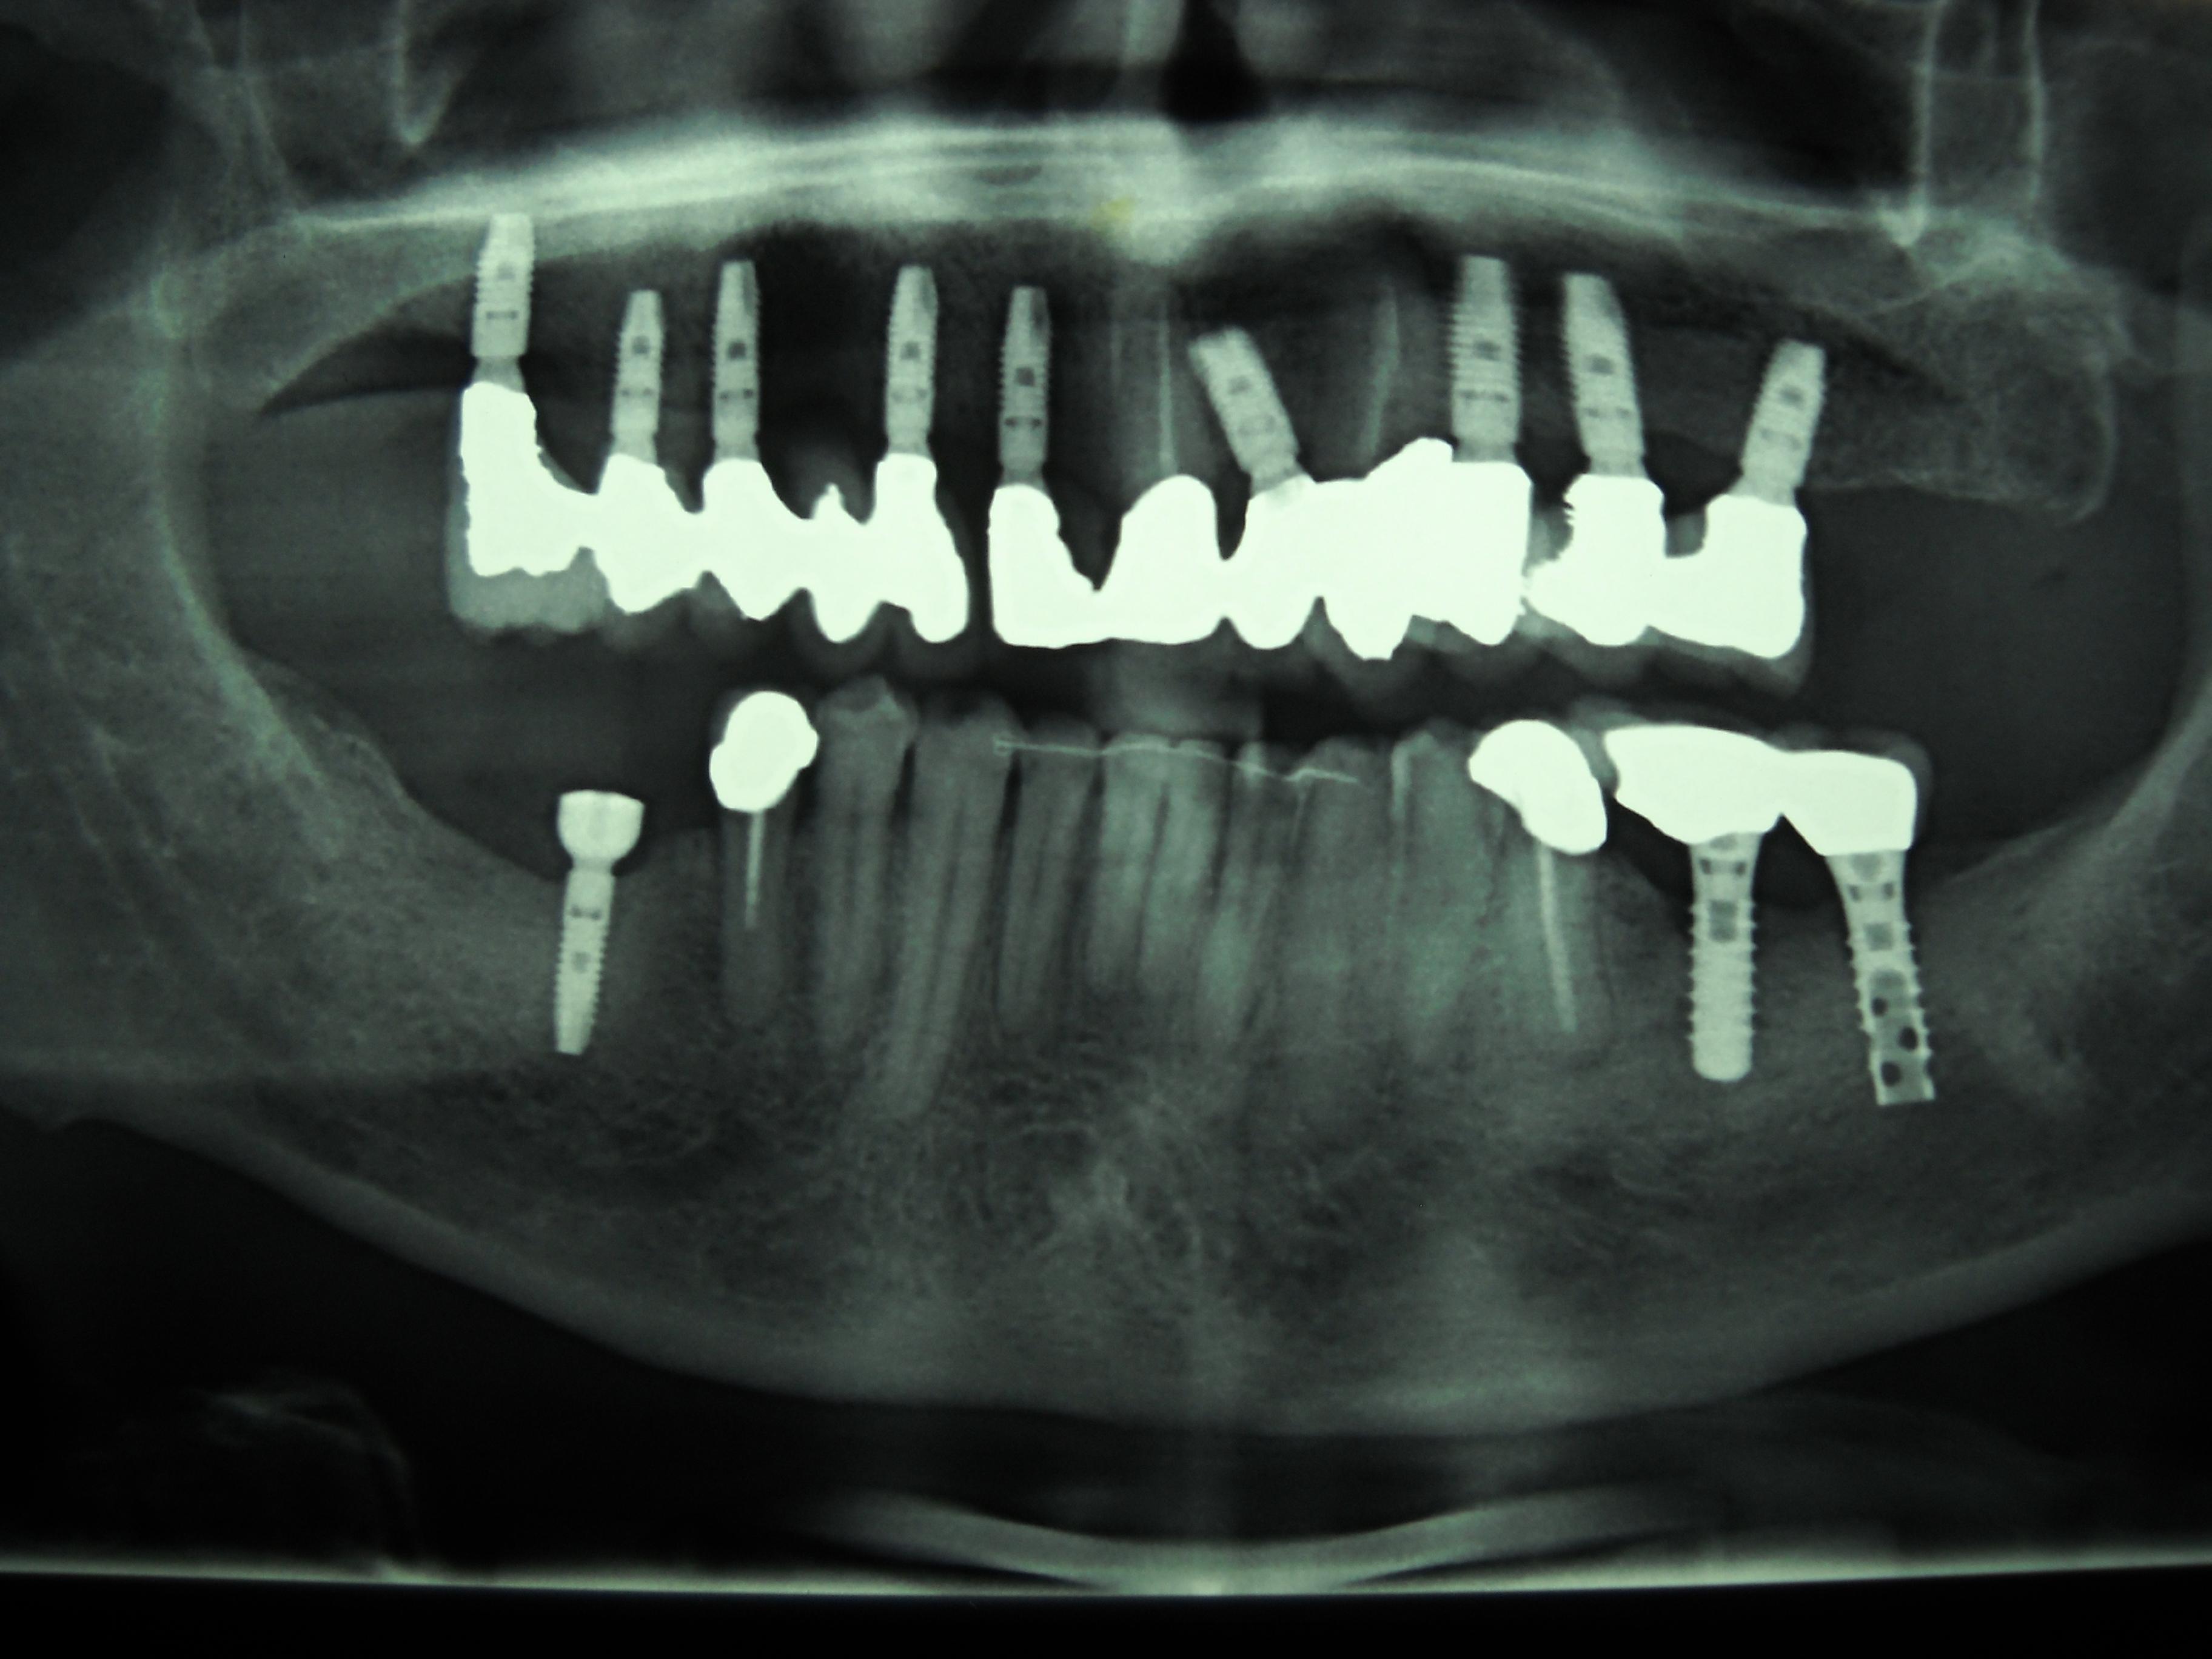 Implantologia dentale: impianti su arcata superiore